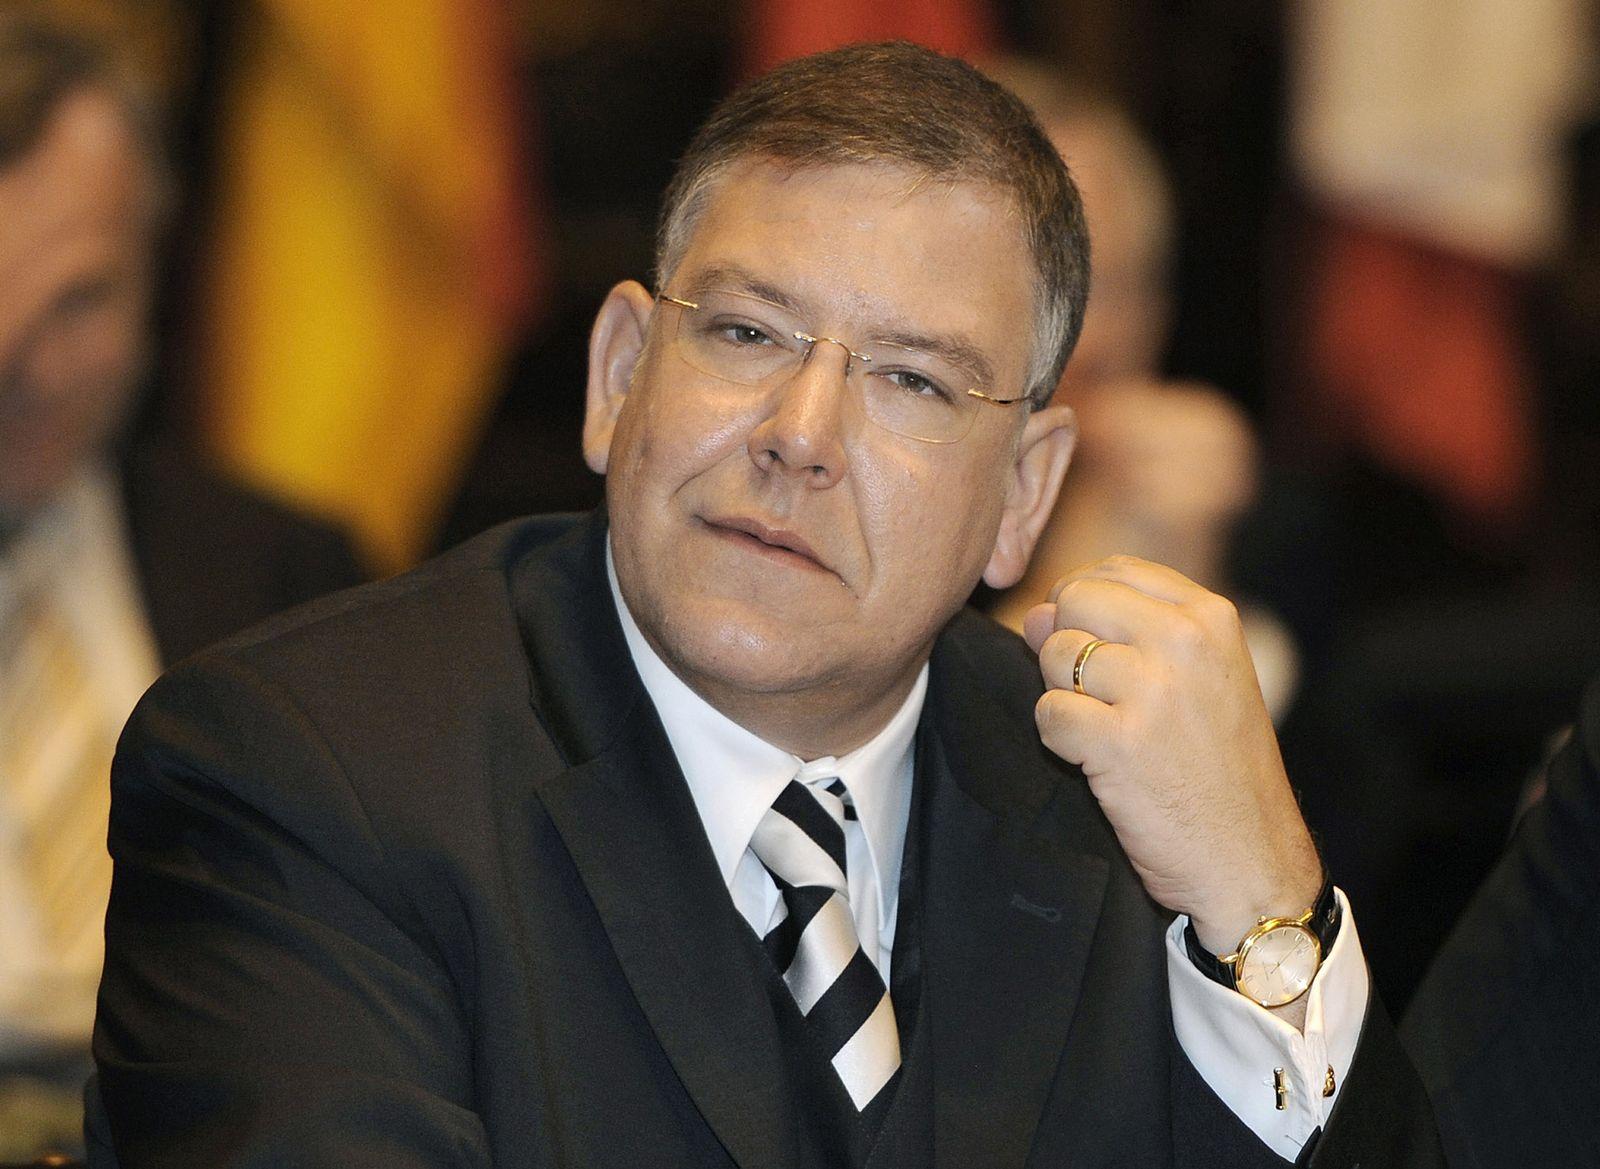 Christoph Ahlhaus